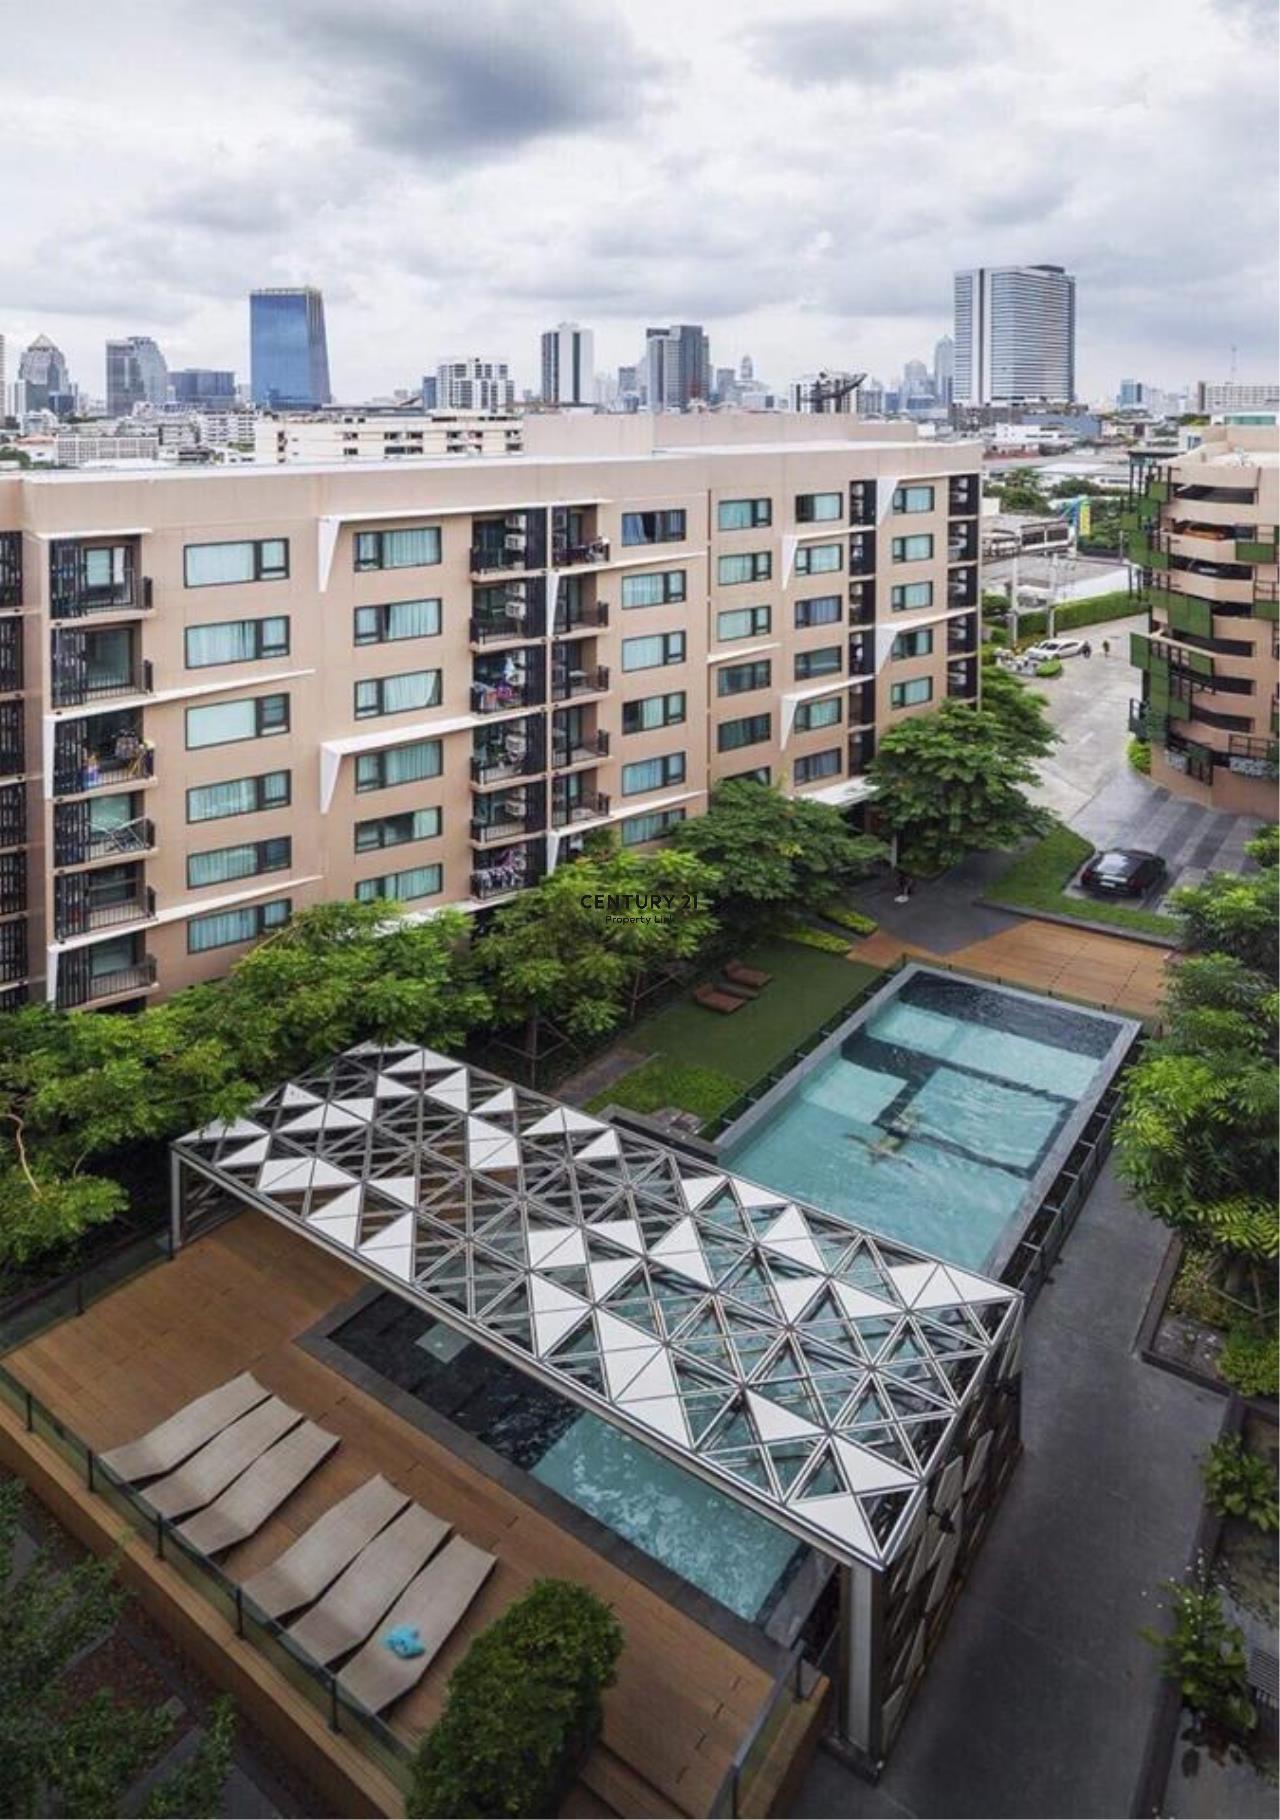 Century21 Property Link Agency's 39-CC-61515 Condolette Pixel Sathorn Condo for Sale 1 bedroom Near MRT Lumpini Sale Price 3.9MB. 11